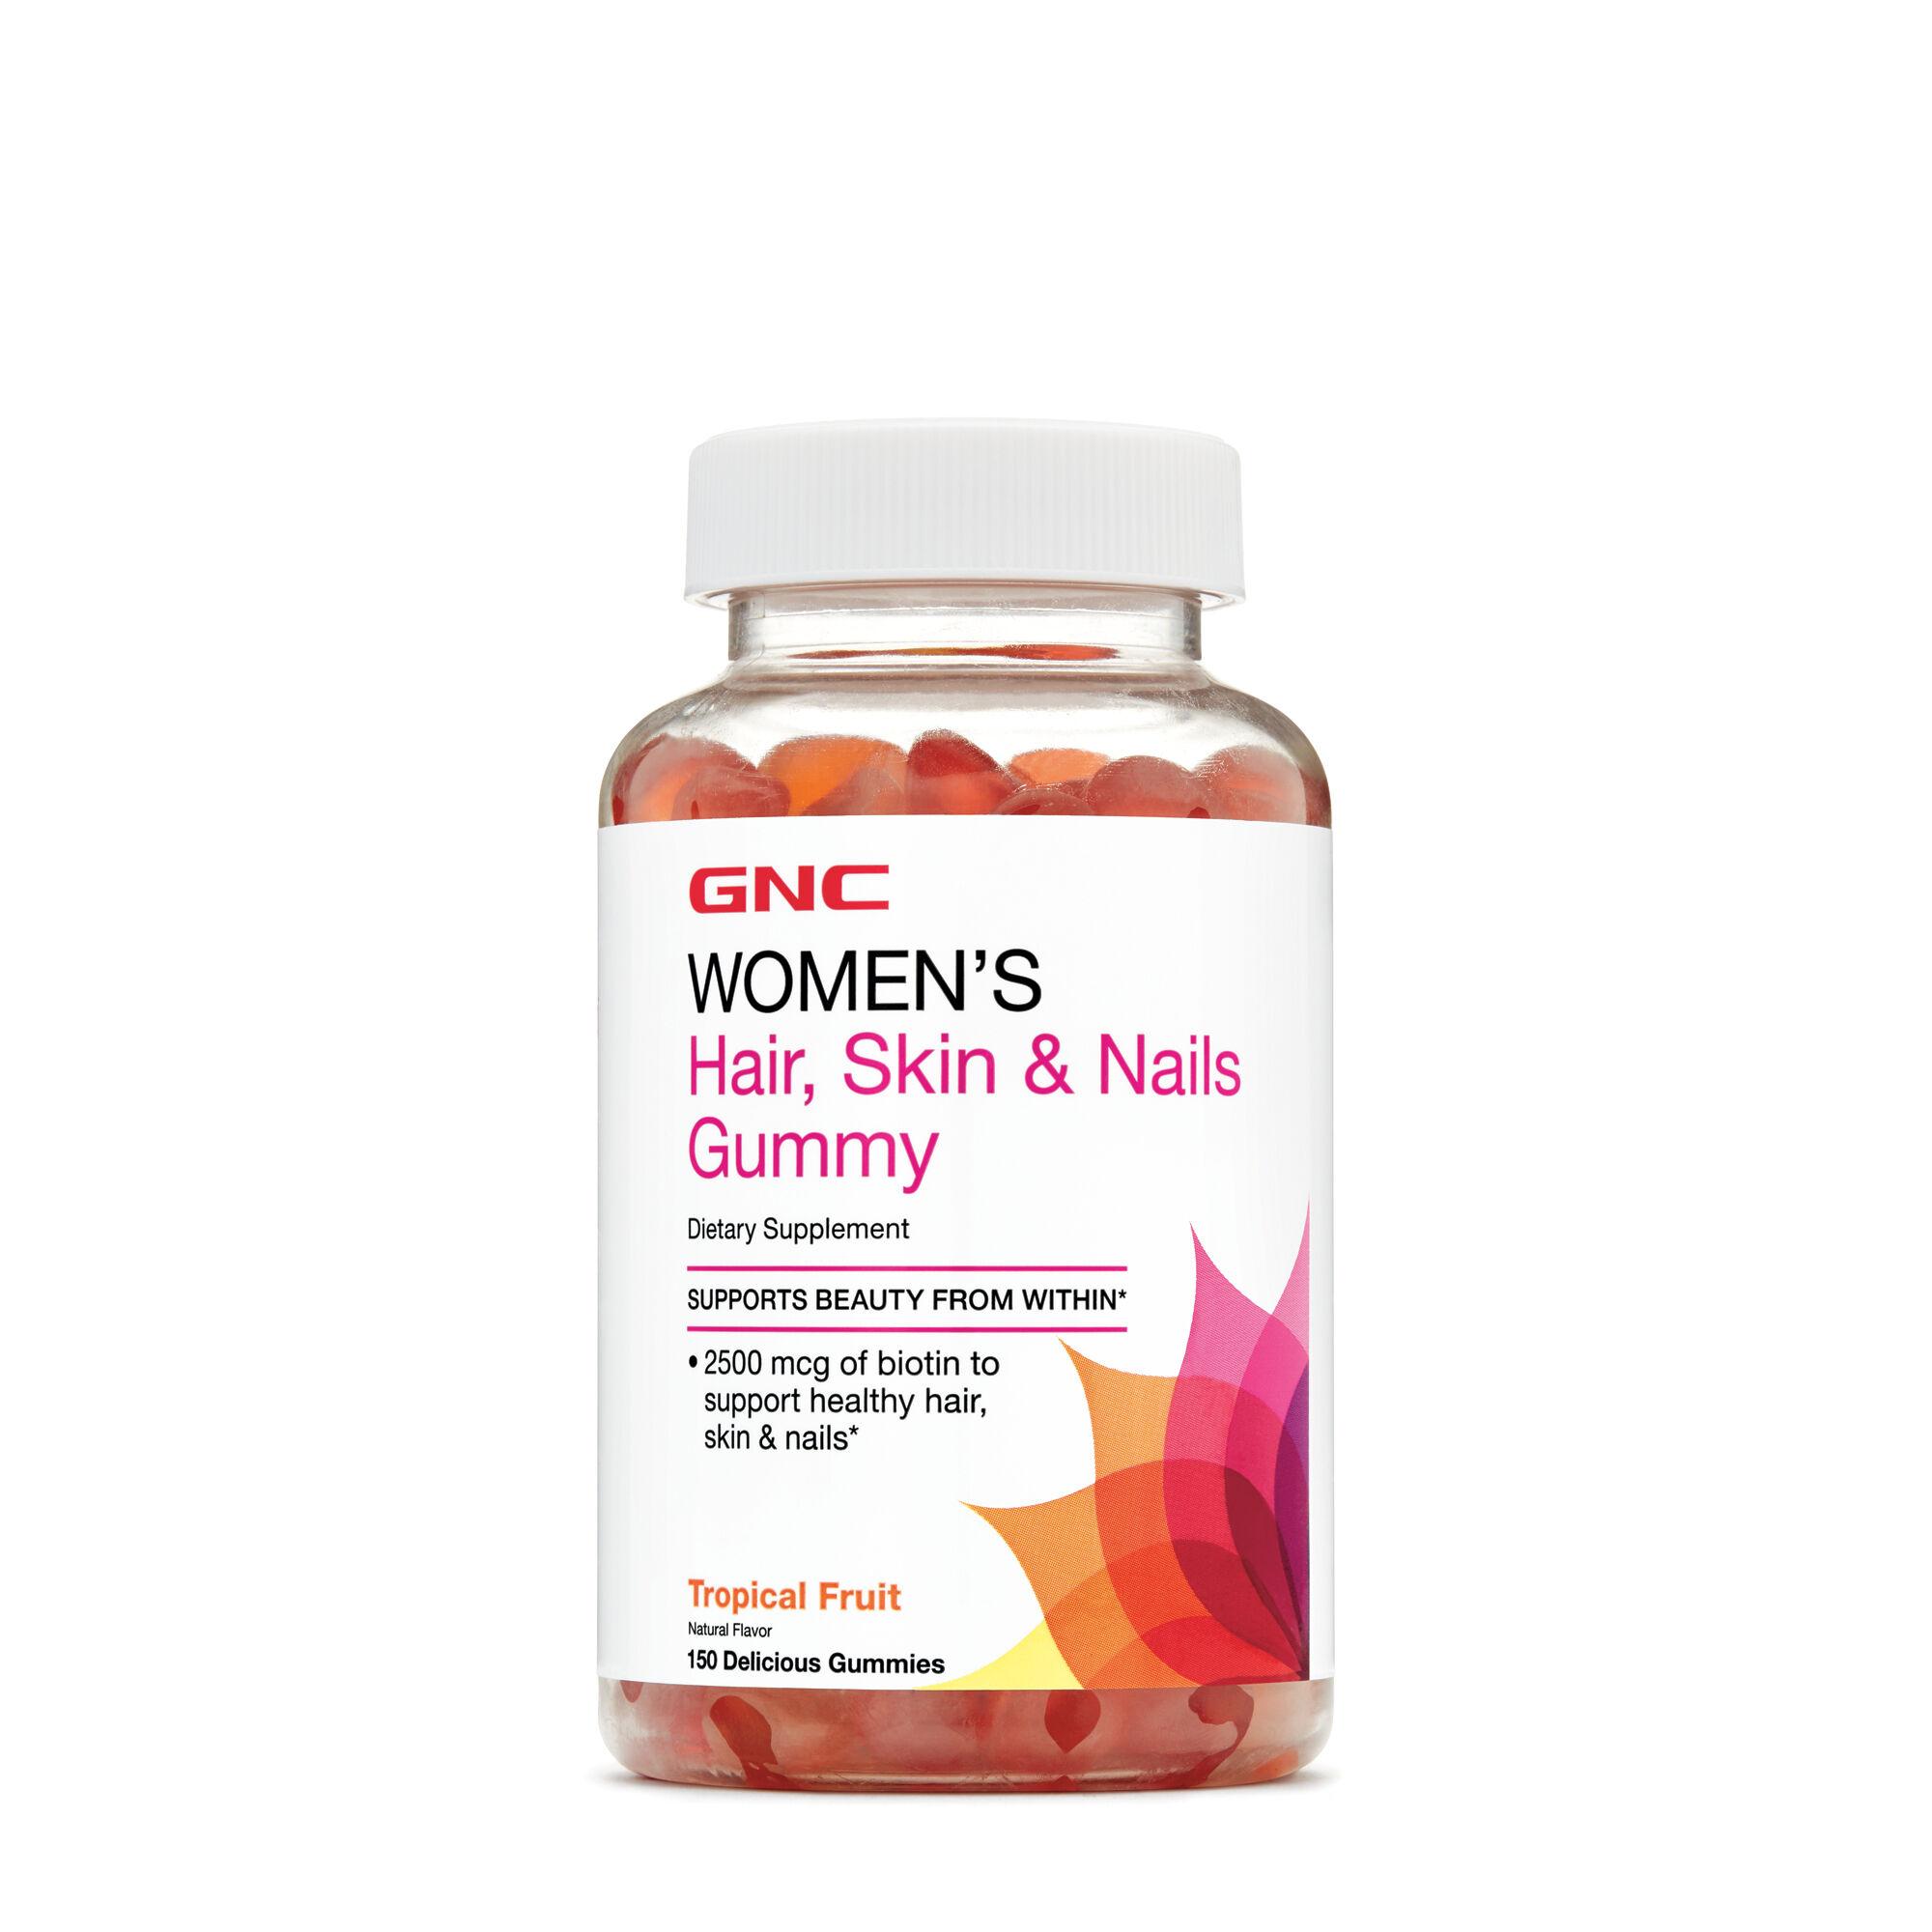 GNC Women\'s Hair, Skin & Nails Gummy - Tropical Fruit